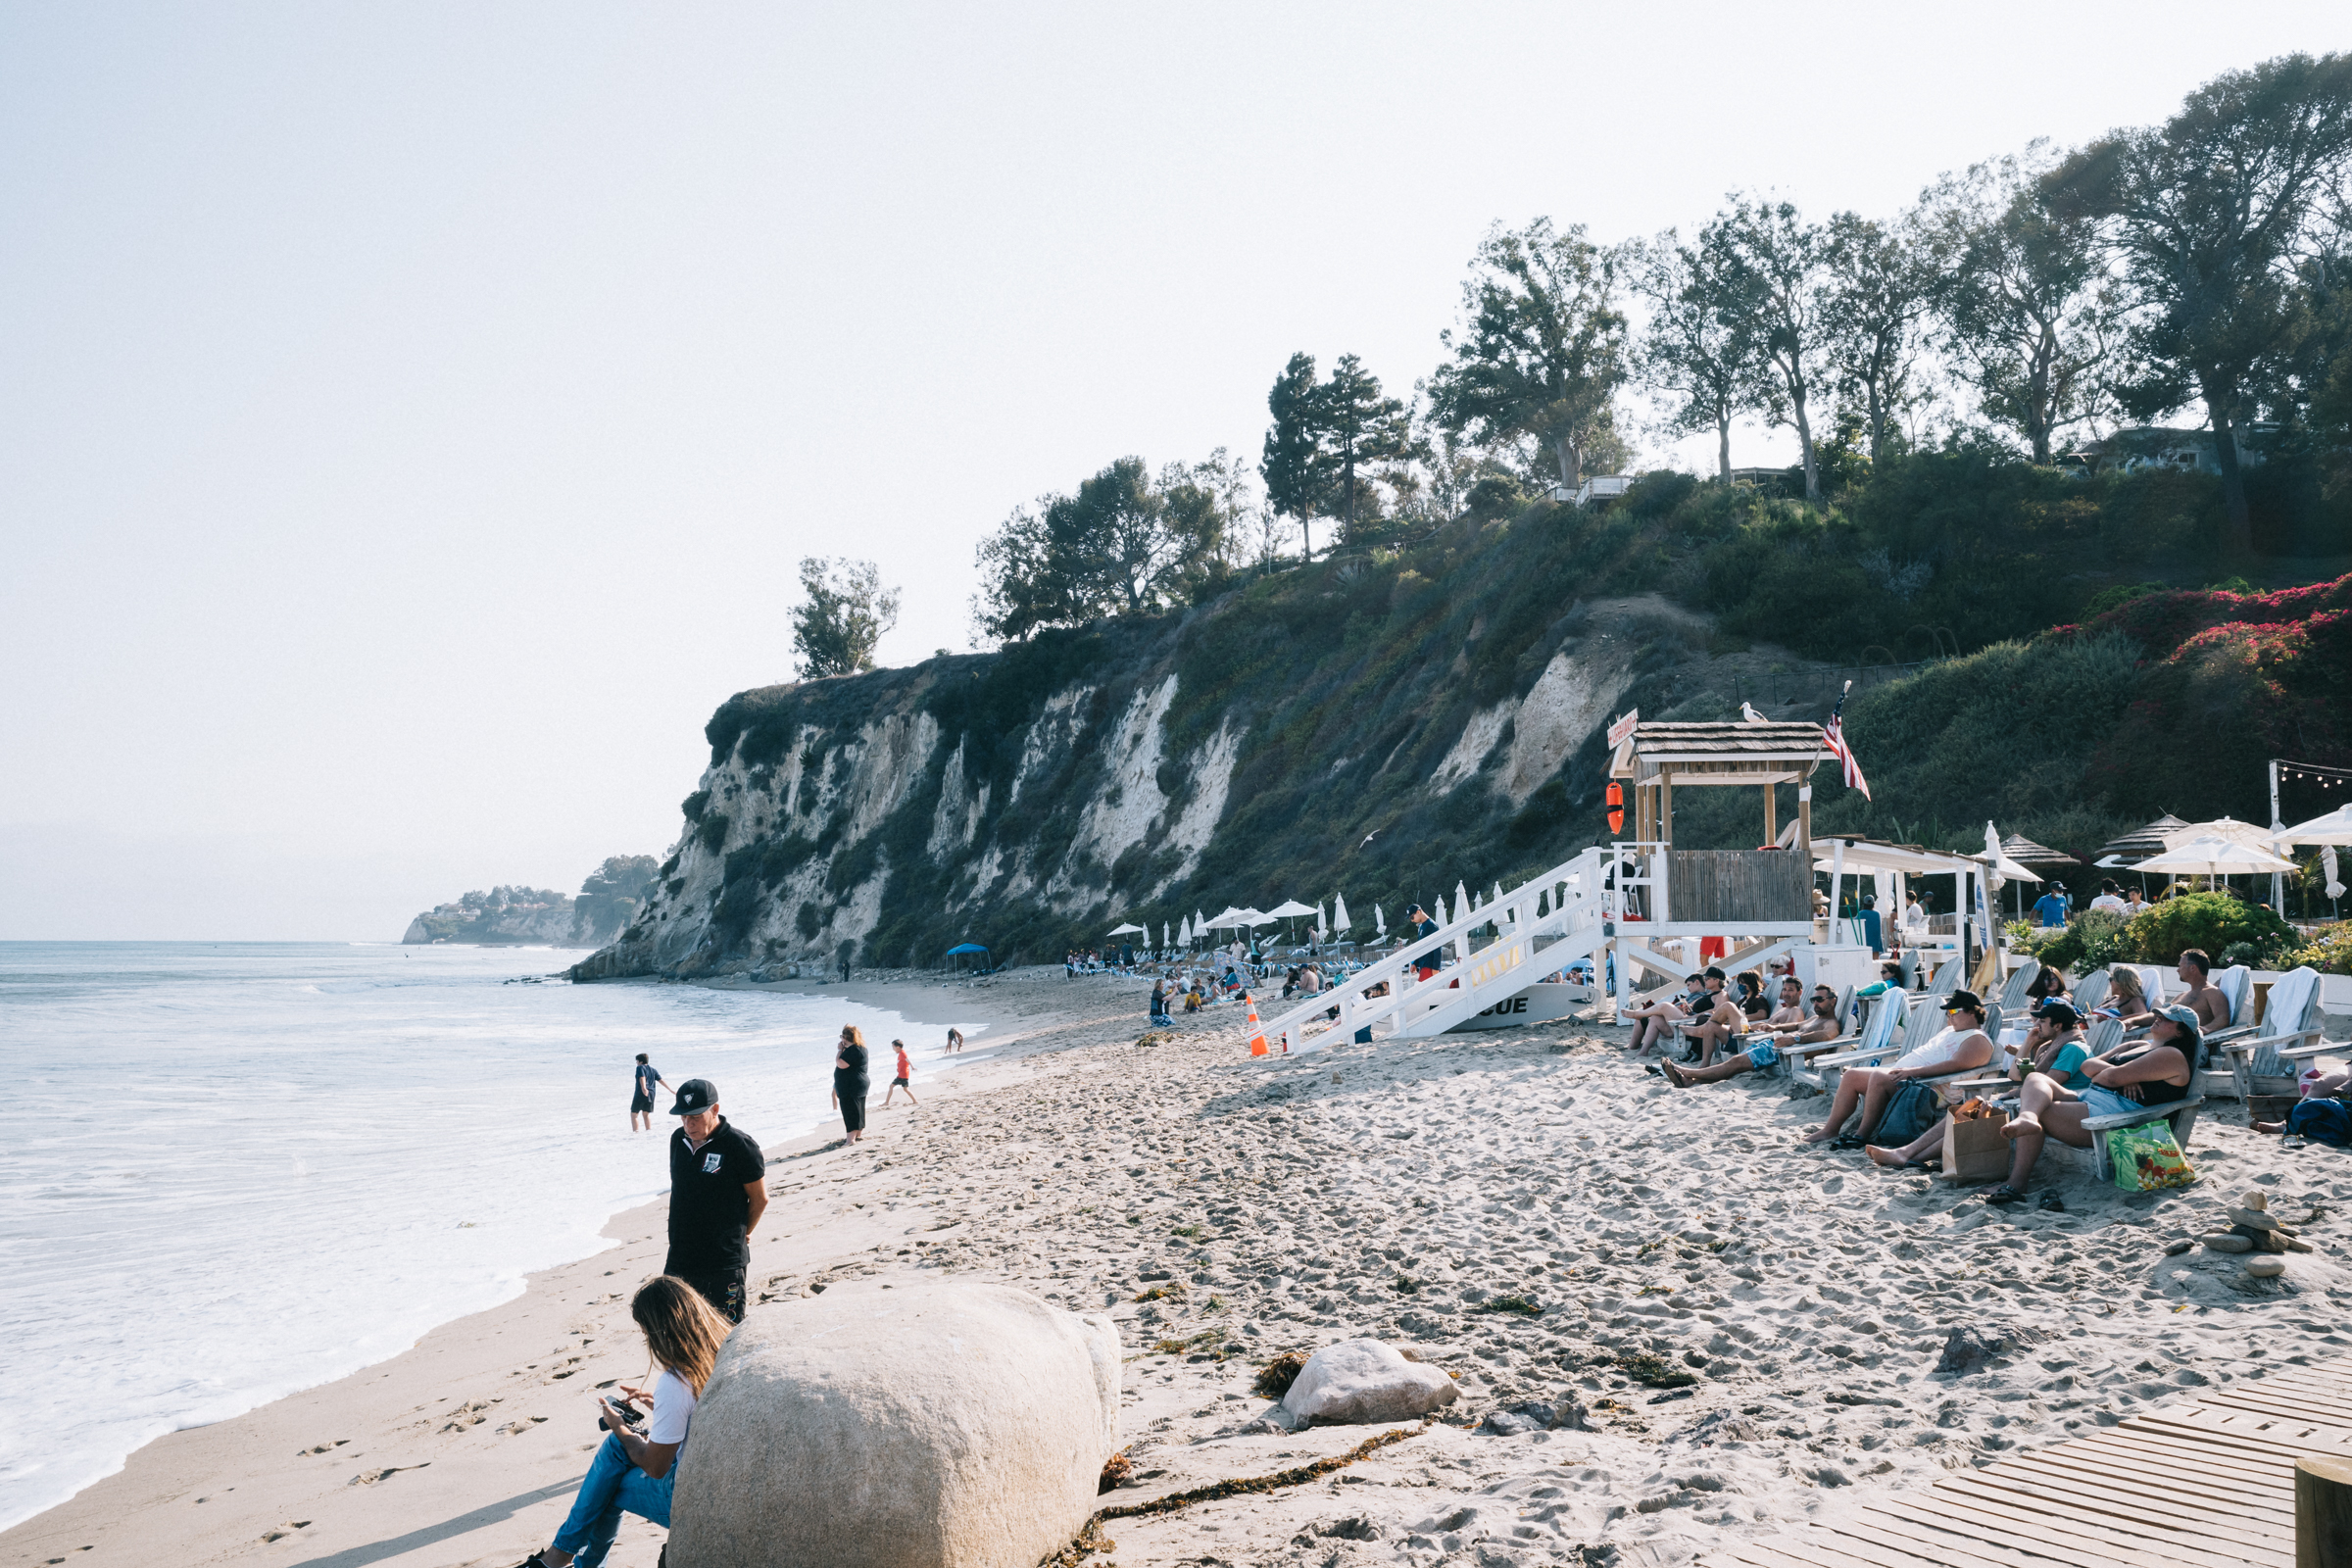 malibu restaurants on the beach Paradise Cove